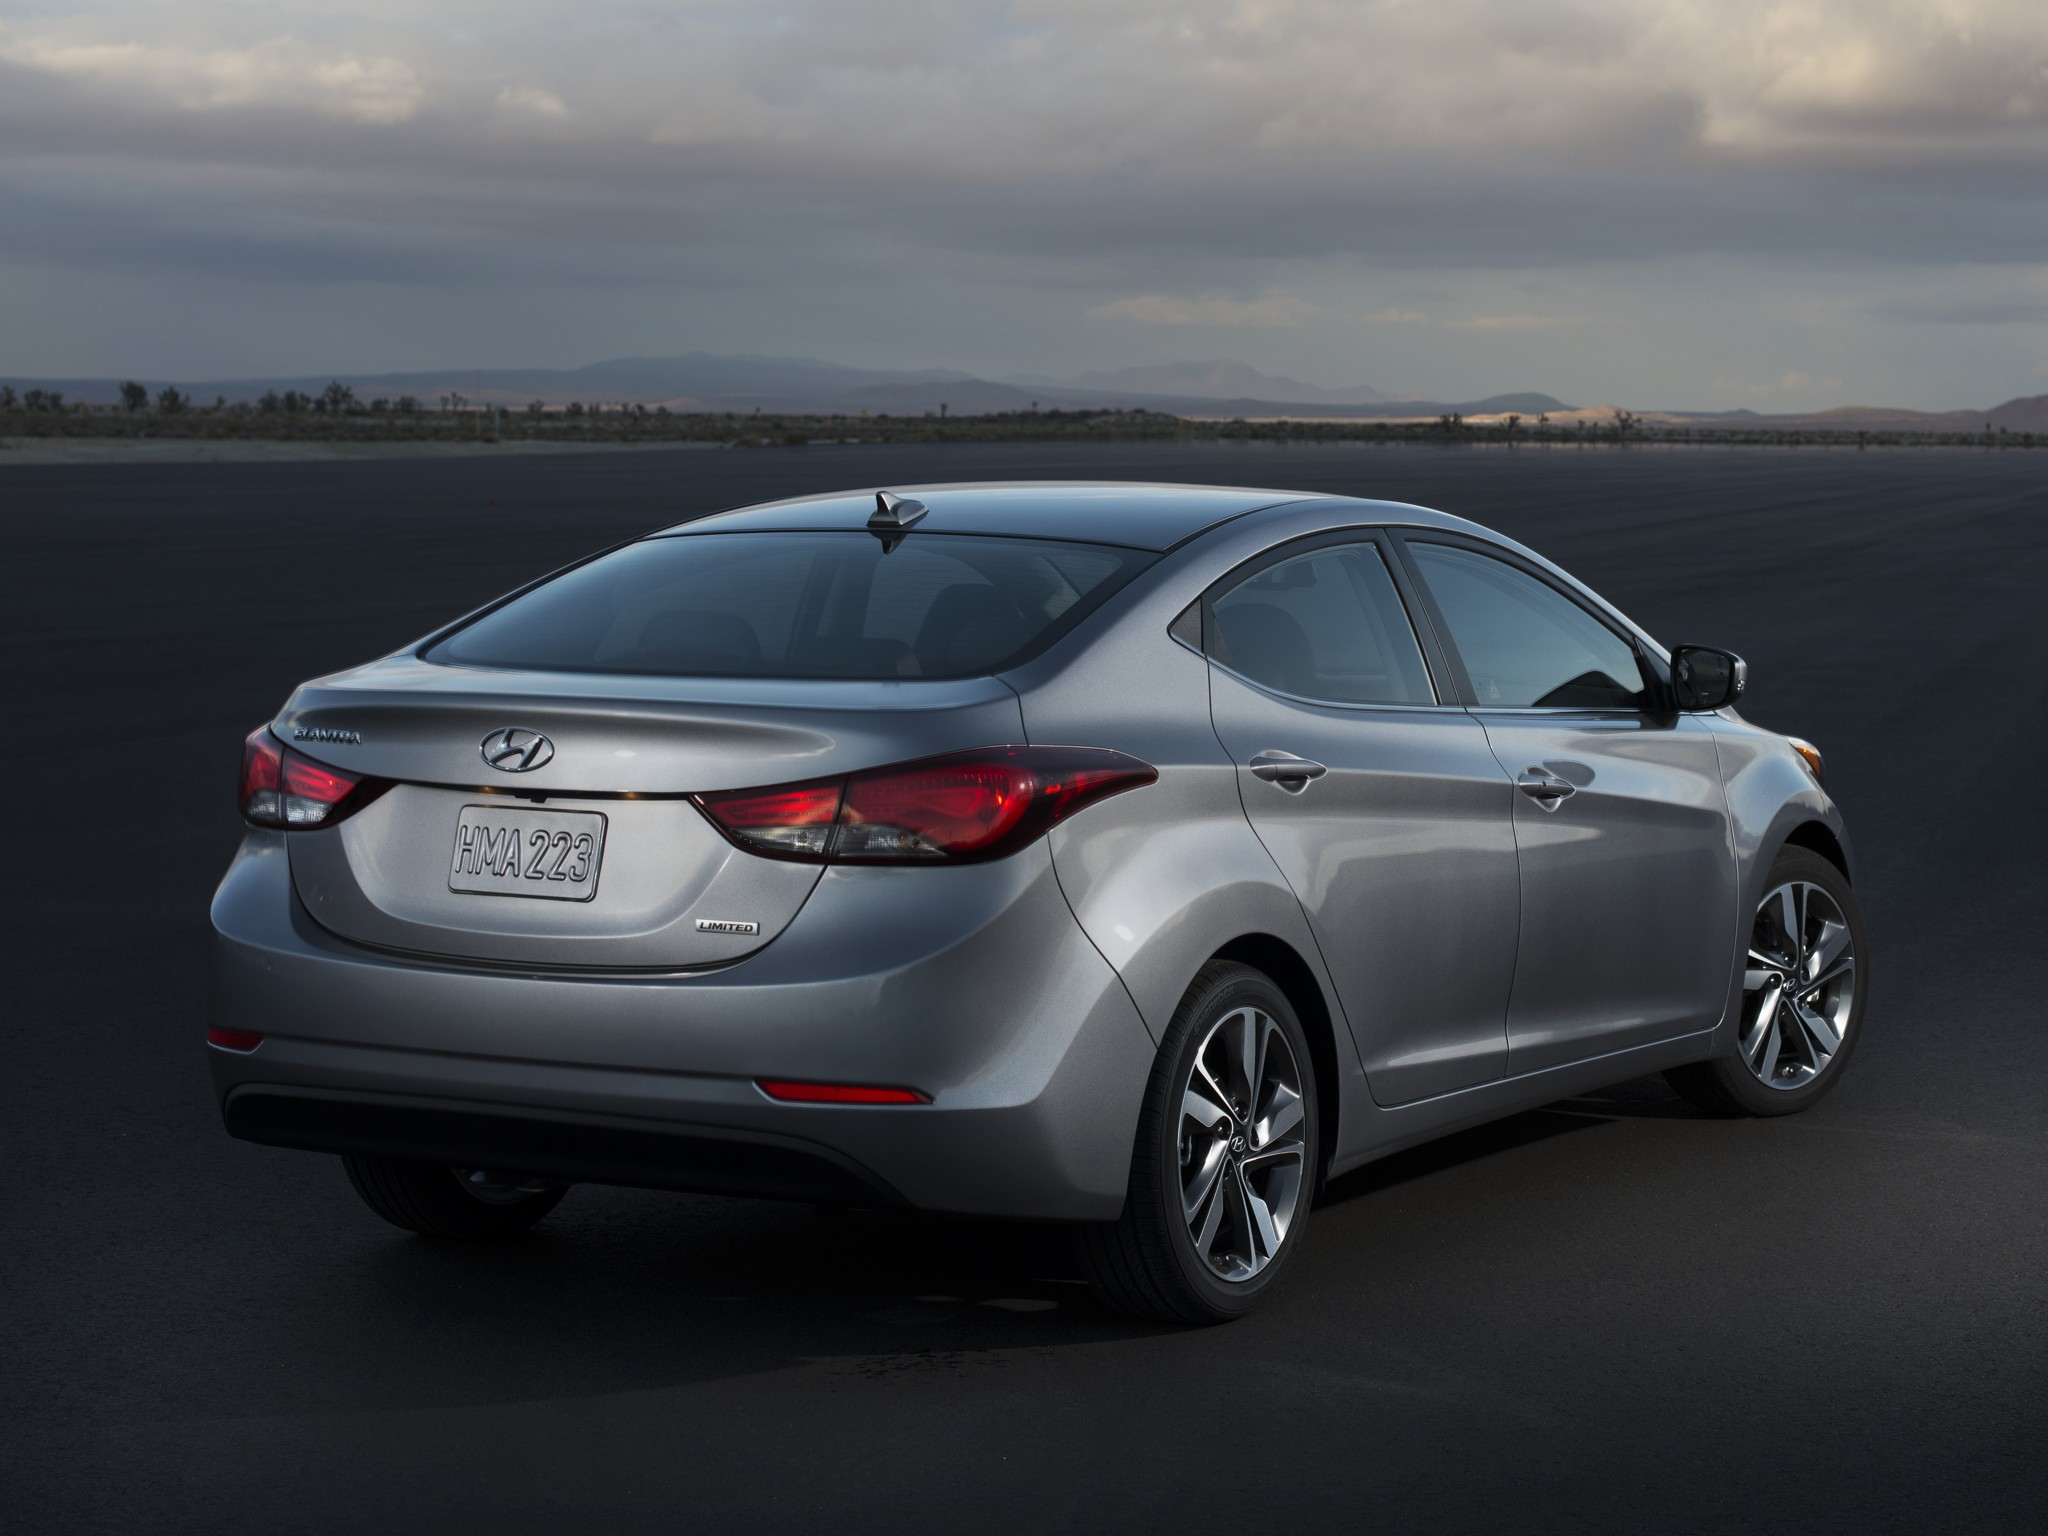 2014 Hyundai Elantra Limited USA